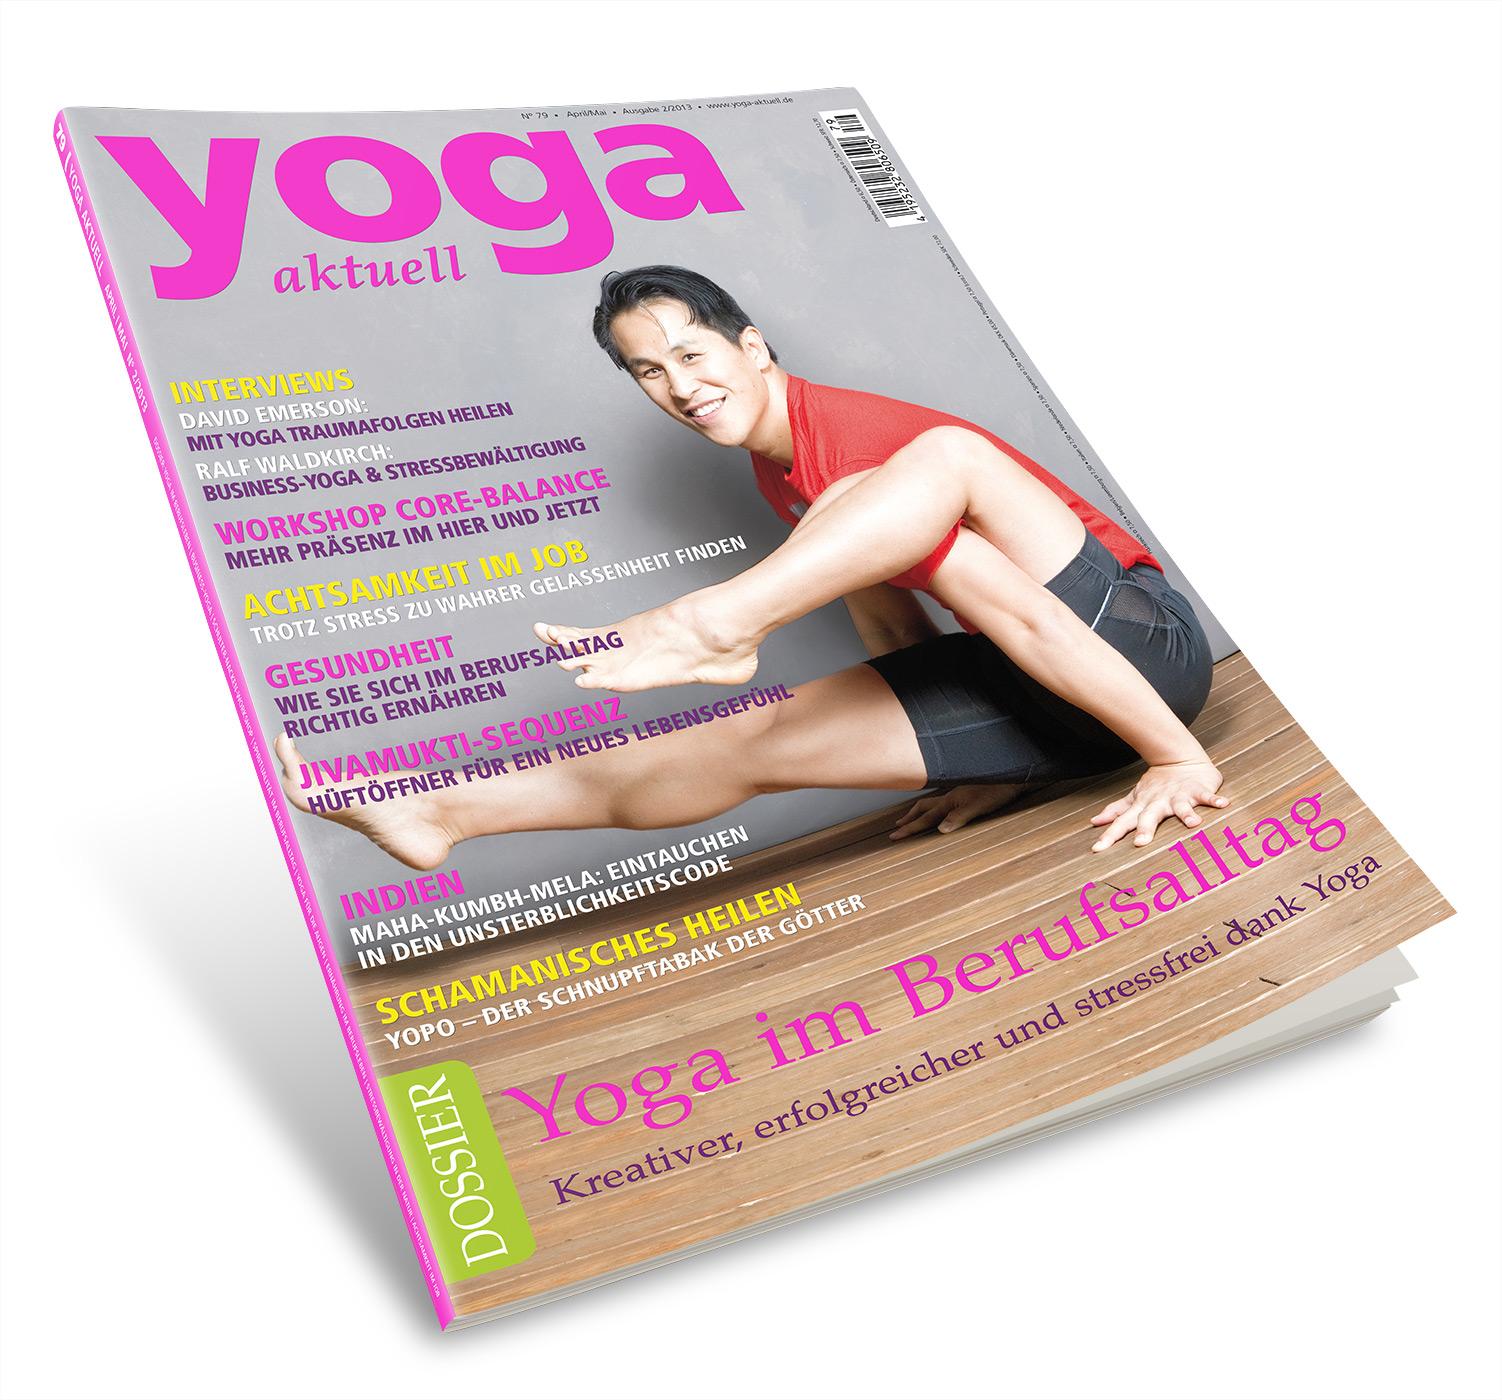 Yoga Aktuell 79 - 02/2013